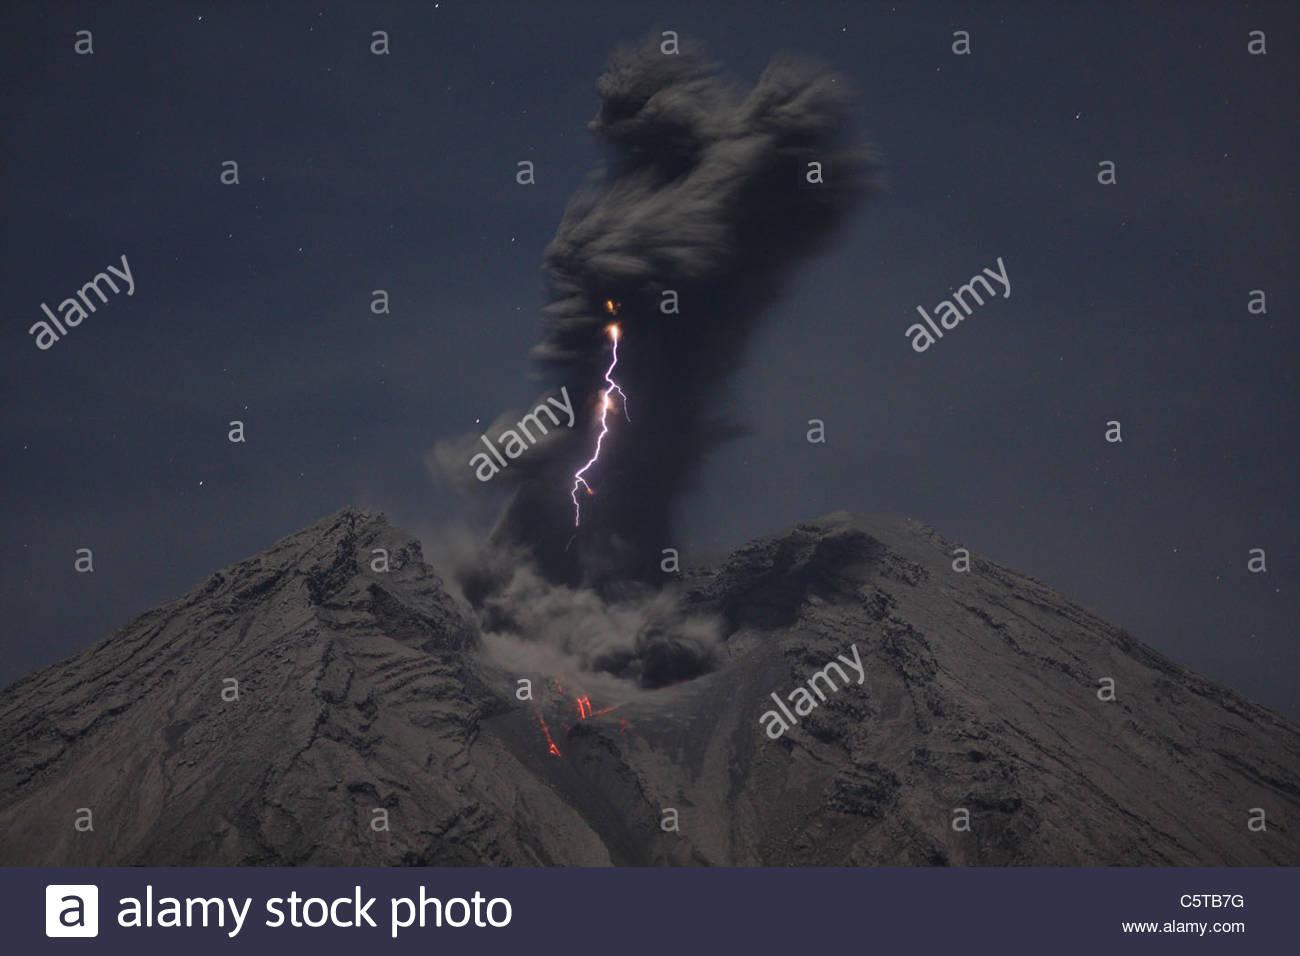 Indonesia, Java, Semeru volcano erupting - Stock Image